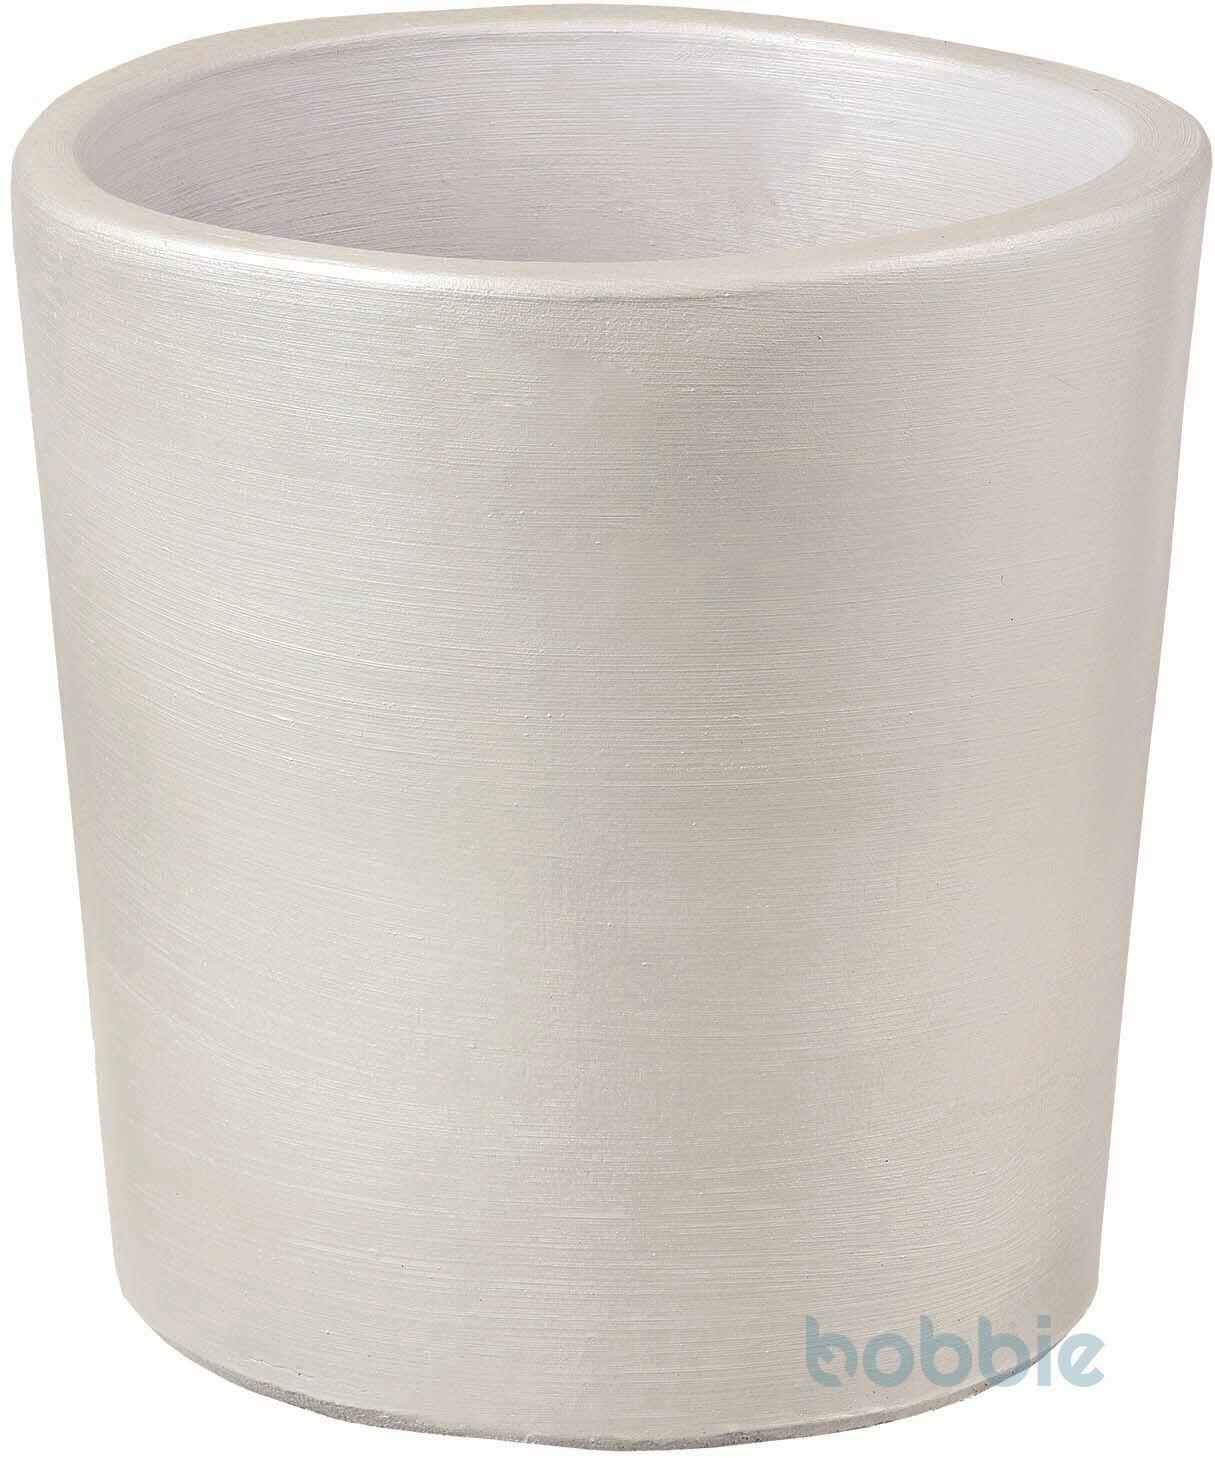 Blumentopf runde Vase modern - VASO ROTONDO MODERNE CM.35 - PREMIUM LIFE - WHITE